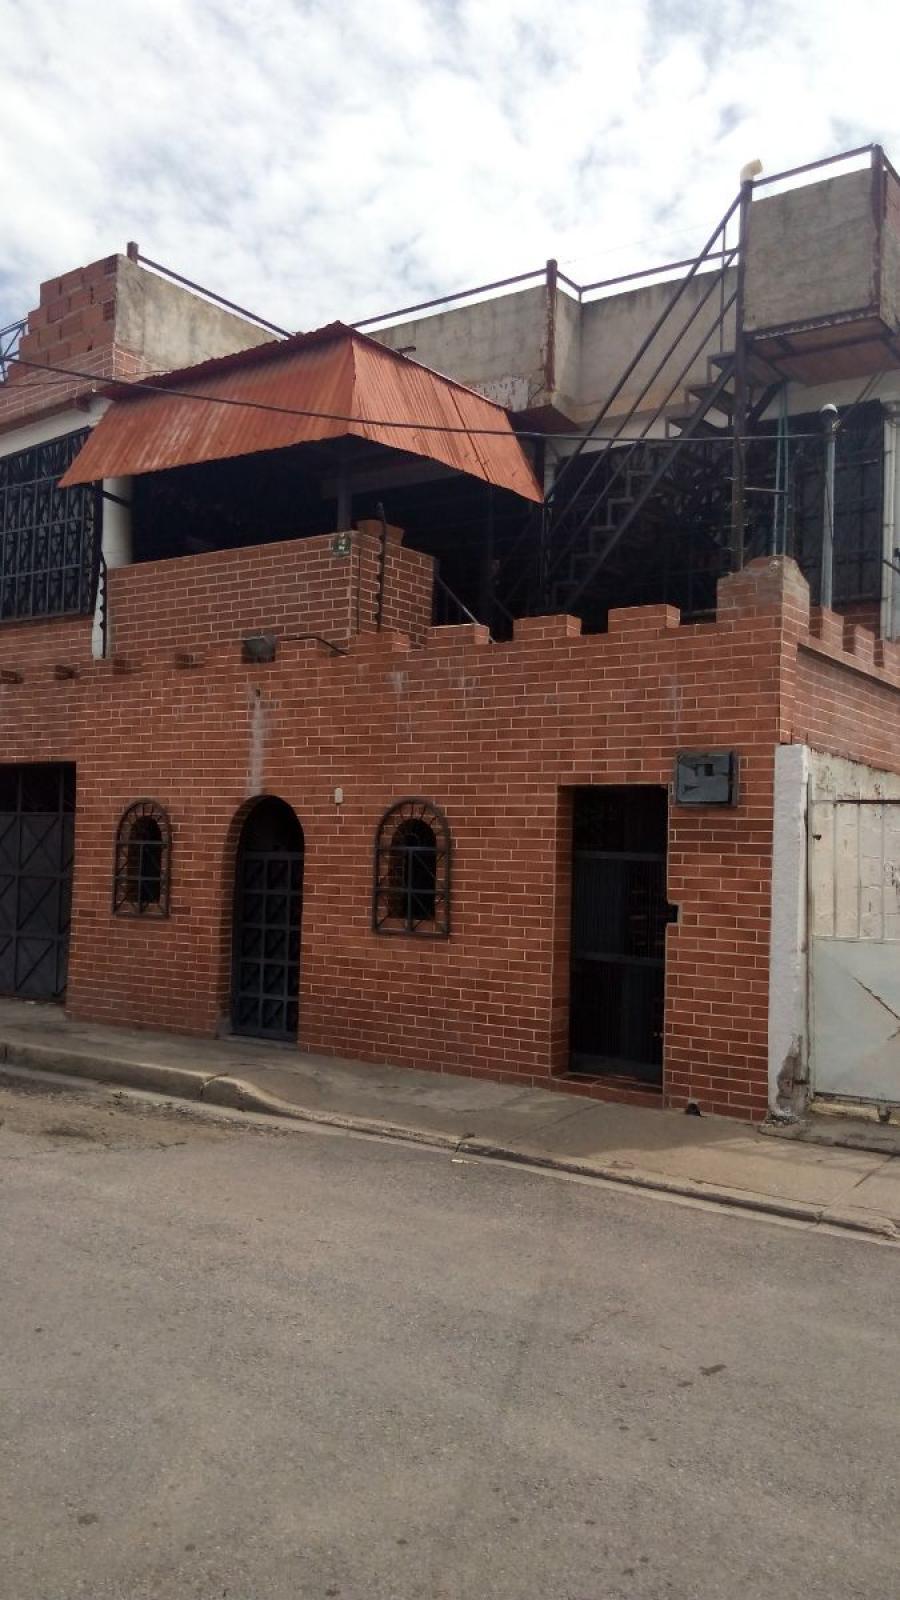 Foto Casa en Venta en @phagrovzla, Casa en Venta Remodelada Pi�onal, Aragua - U$D 35.000 - CAV131818 - BienesOnLine